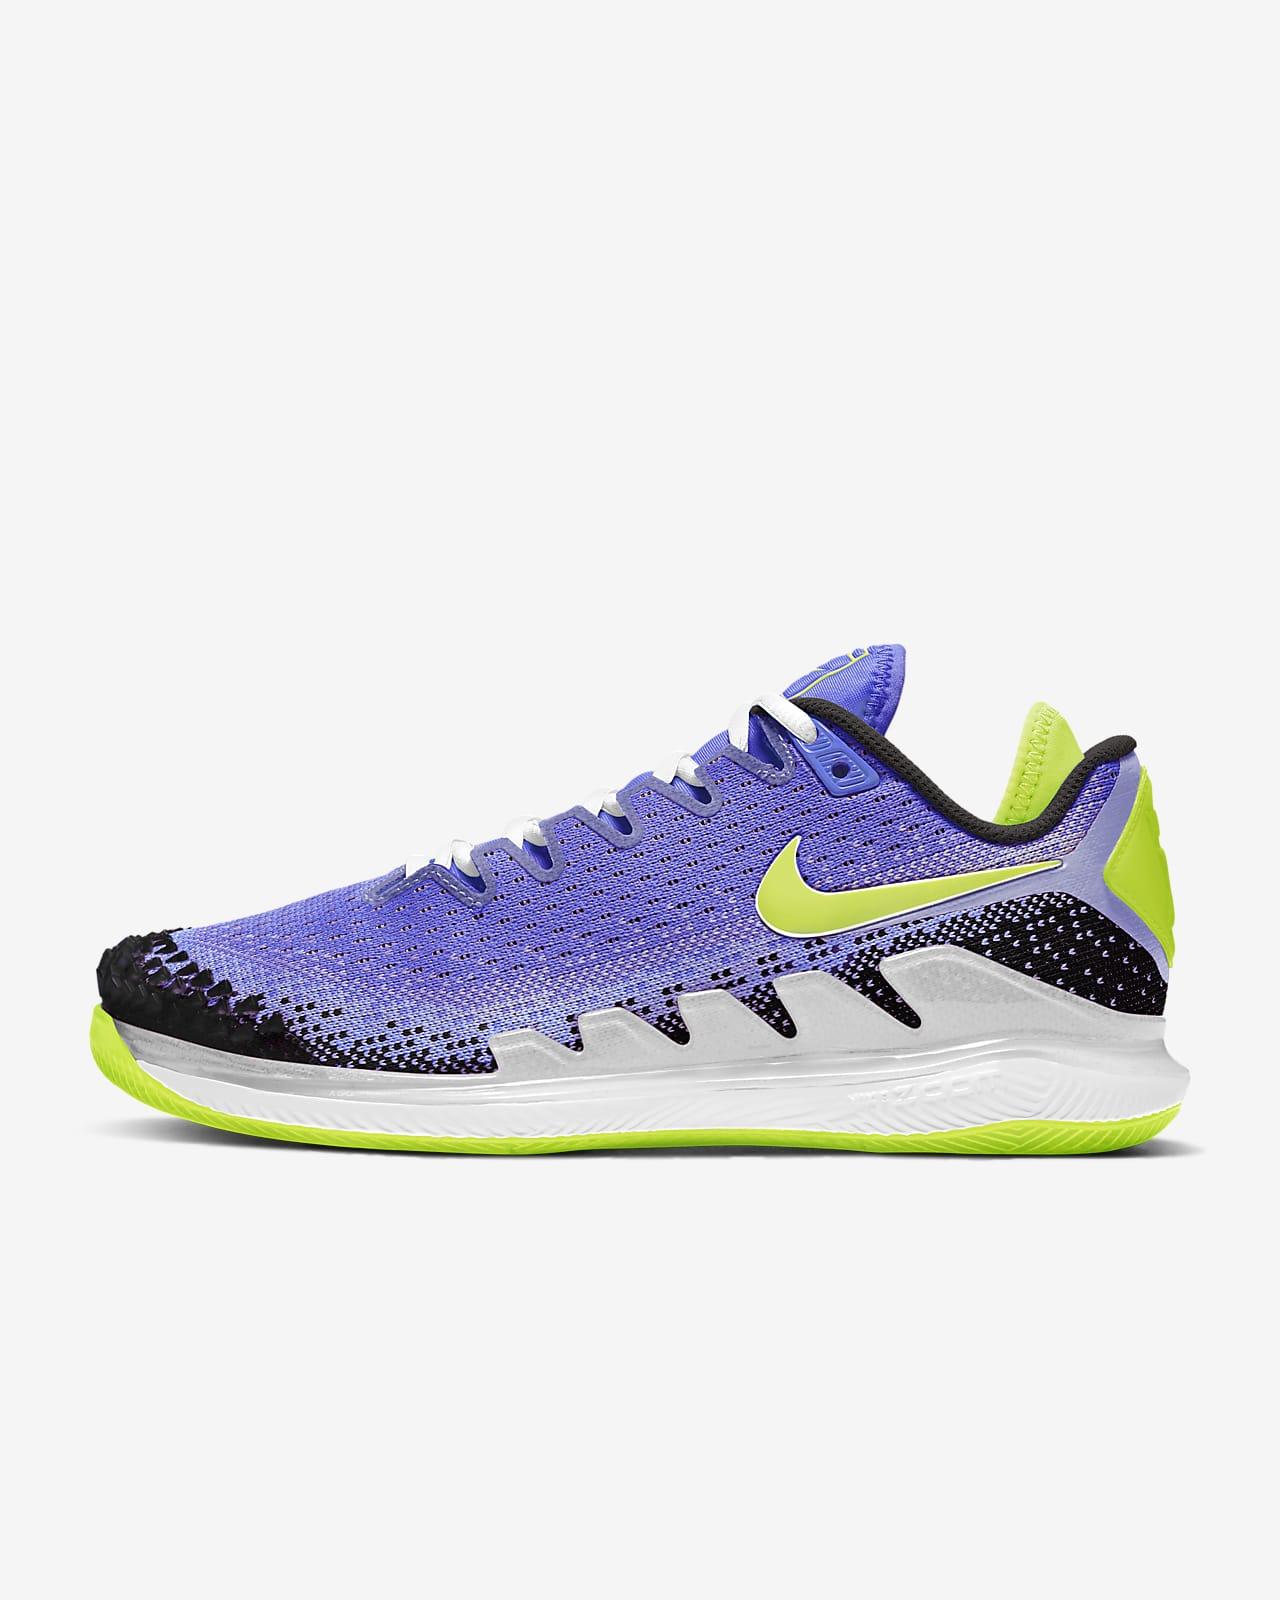 NikeCourt Air Zoom Vapor X Knit-hardcourt-tennissko til kvinder